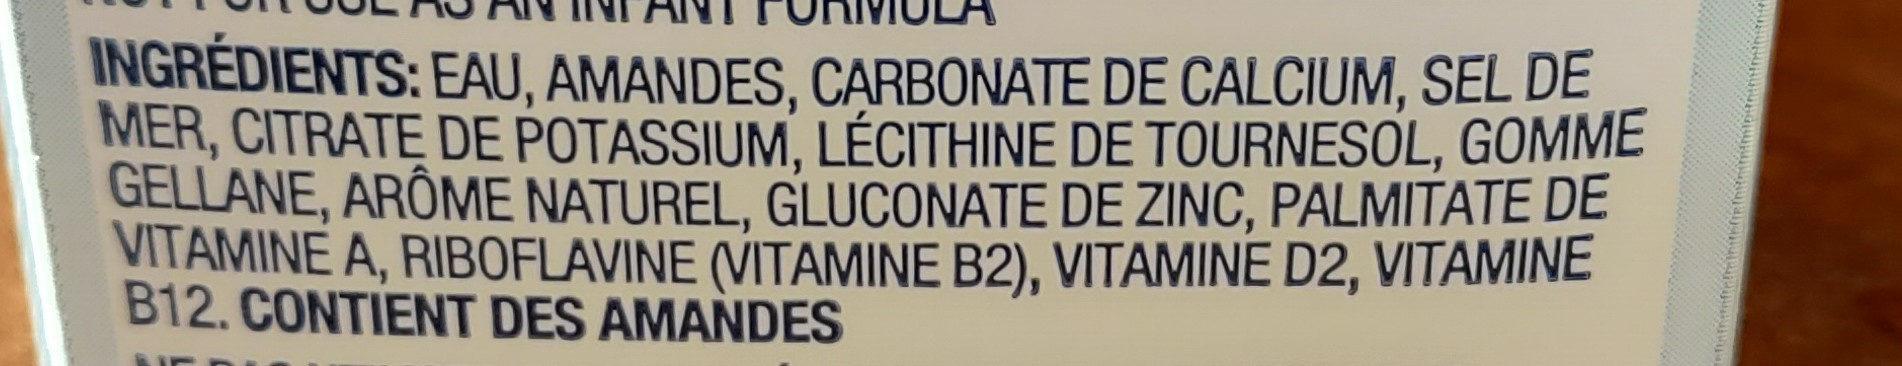 Almond Breeze - Ingredients - fr